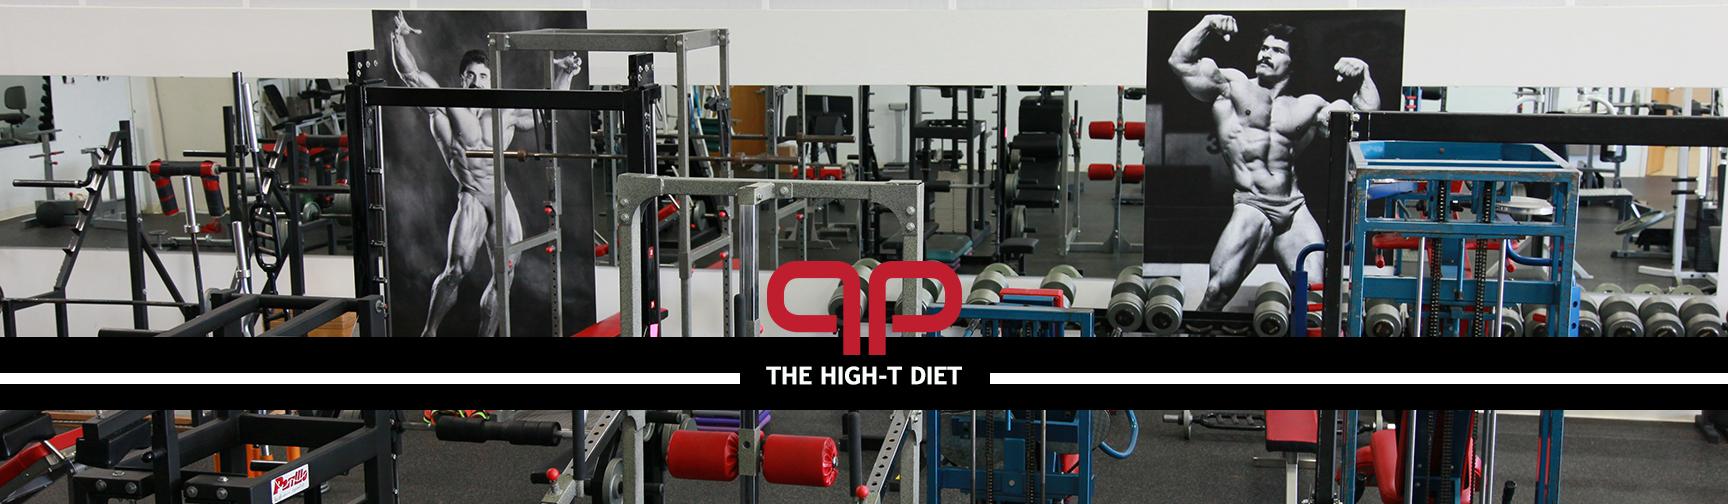 the-high-t-diet-banner